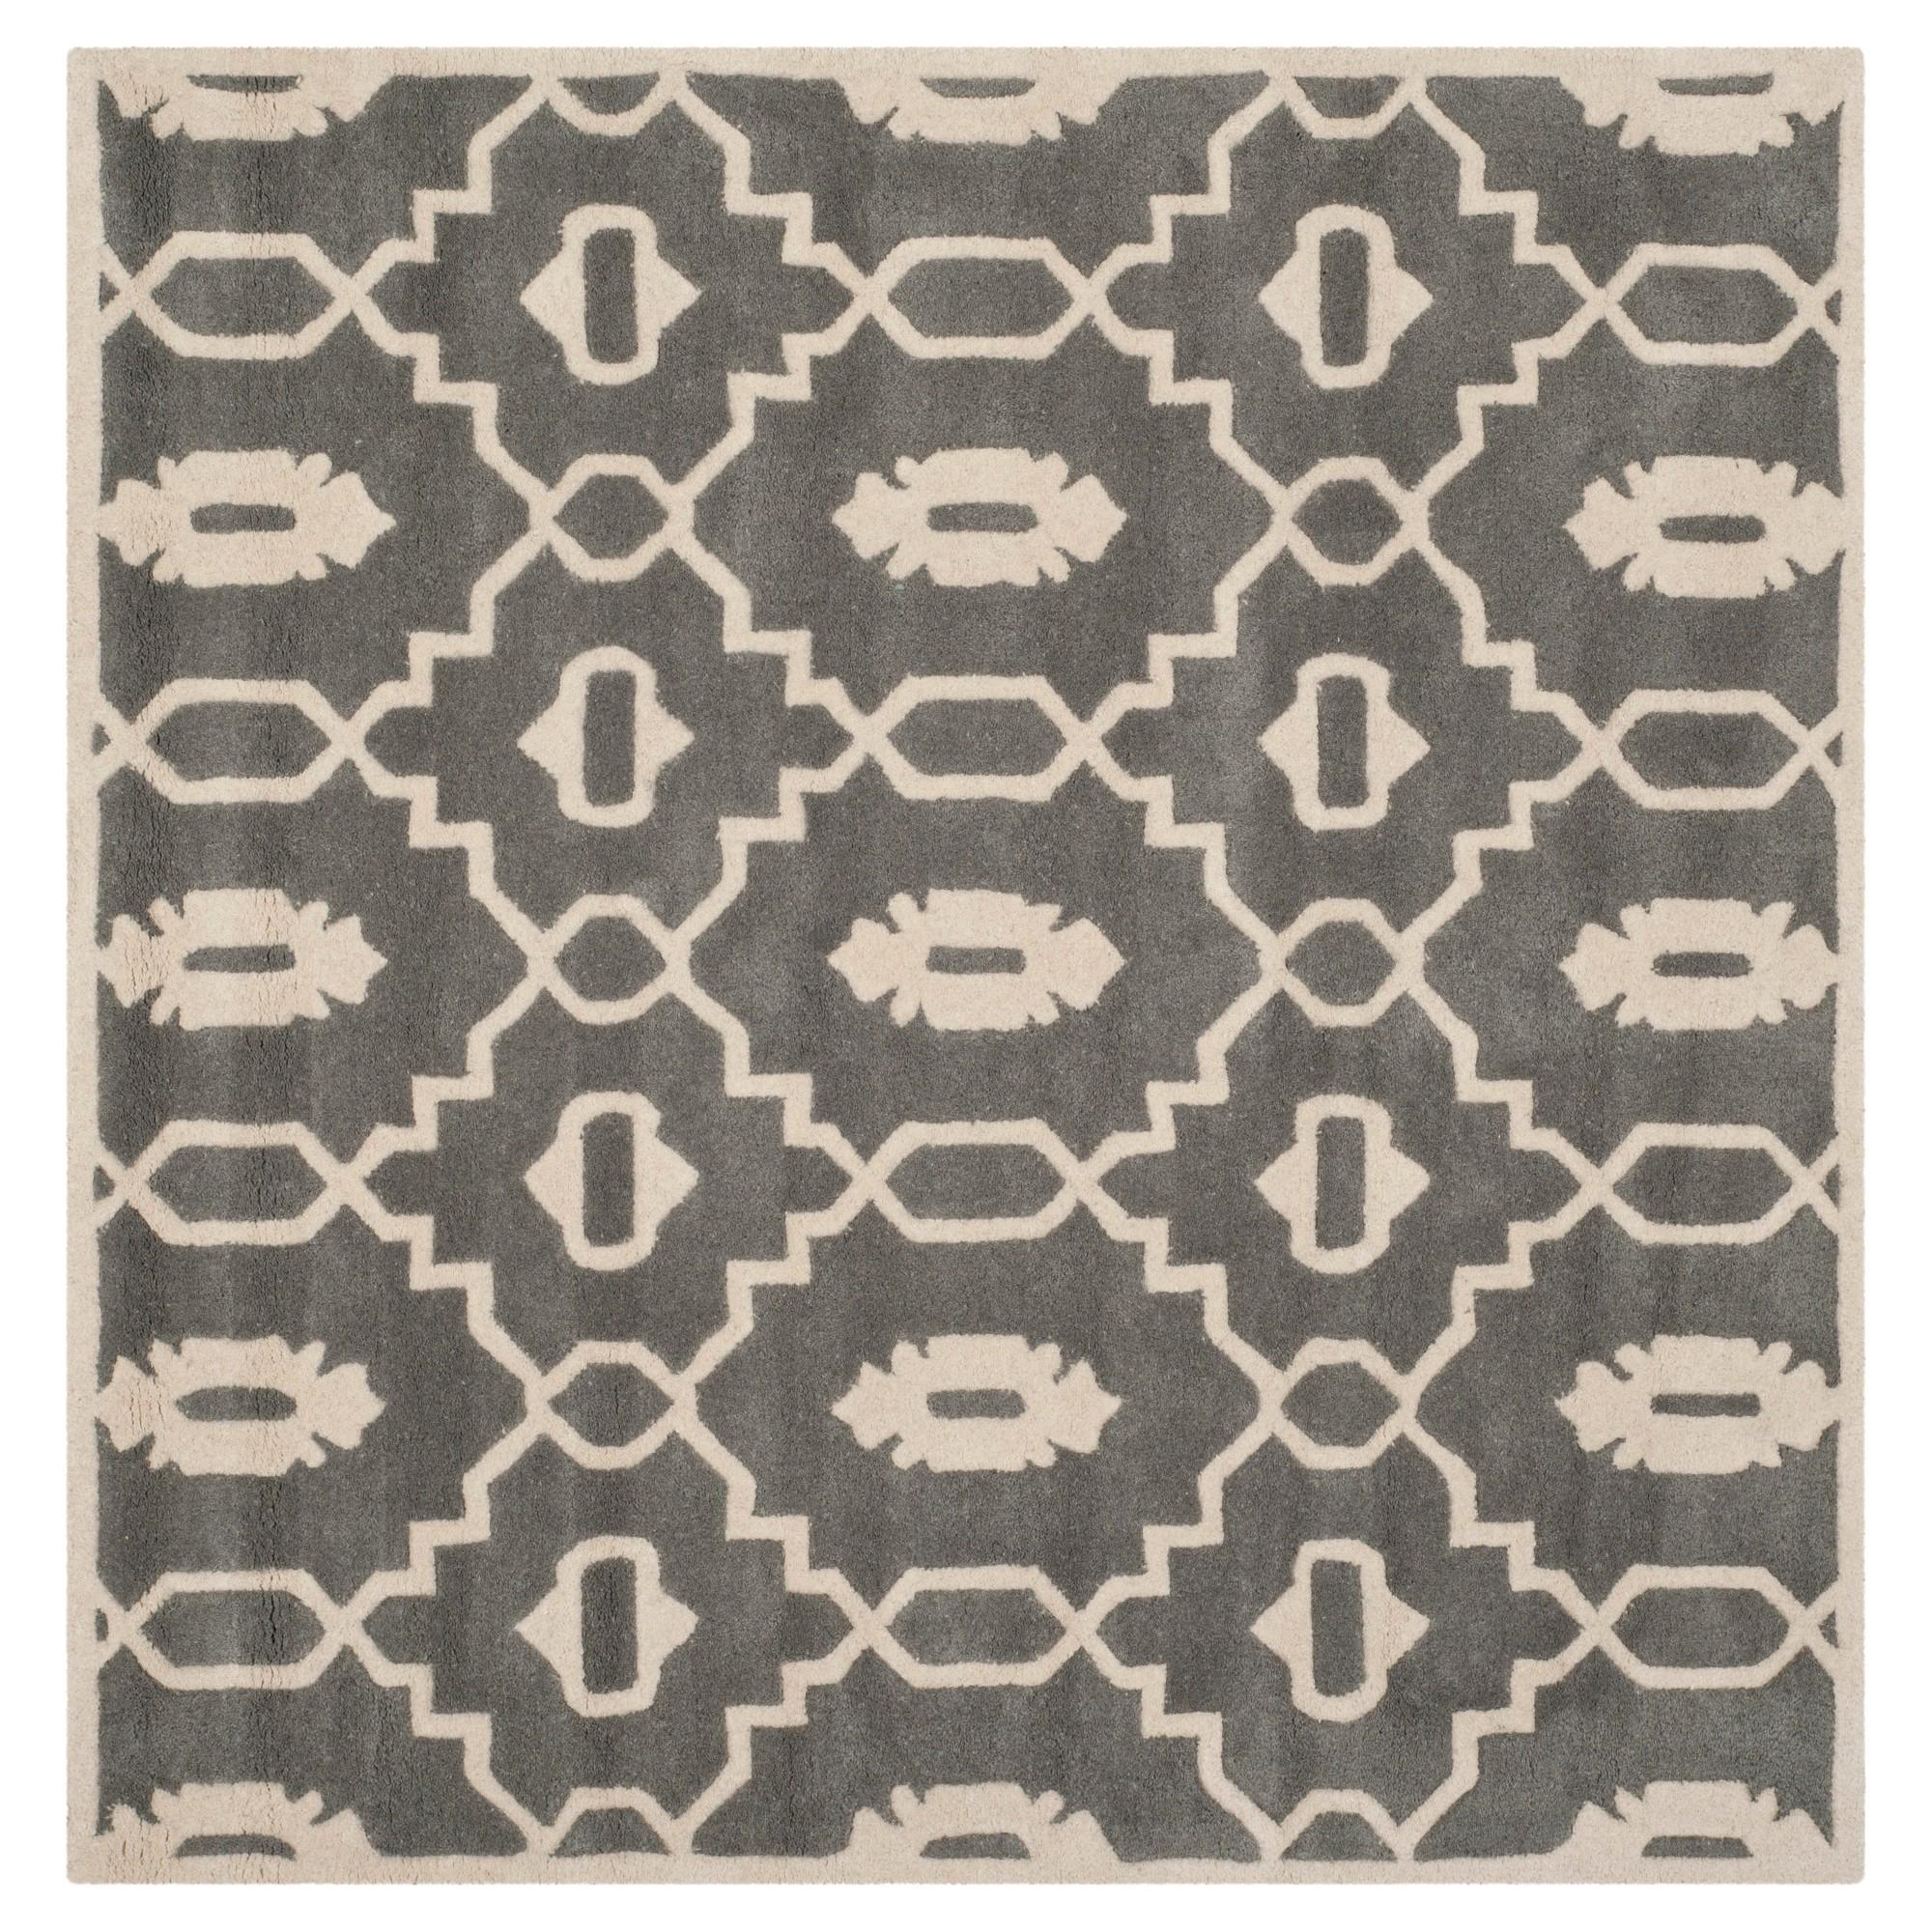 Dark Gray/Ivory Geometric Tufted Square Accent Rug - (3'X3') - Safavieh